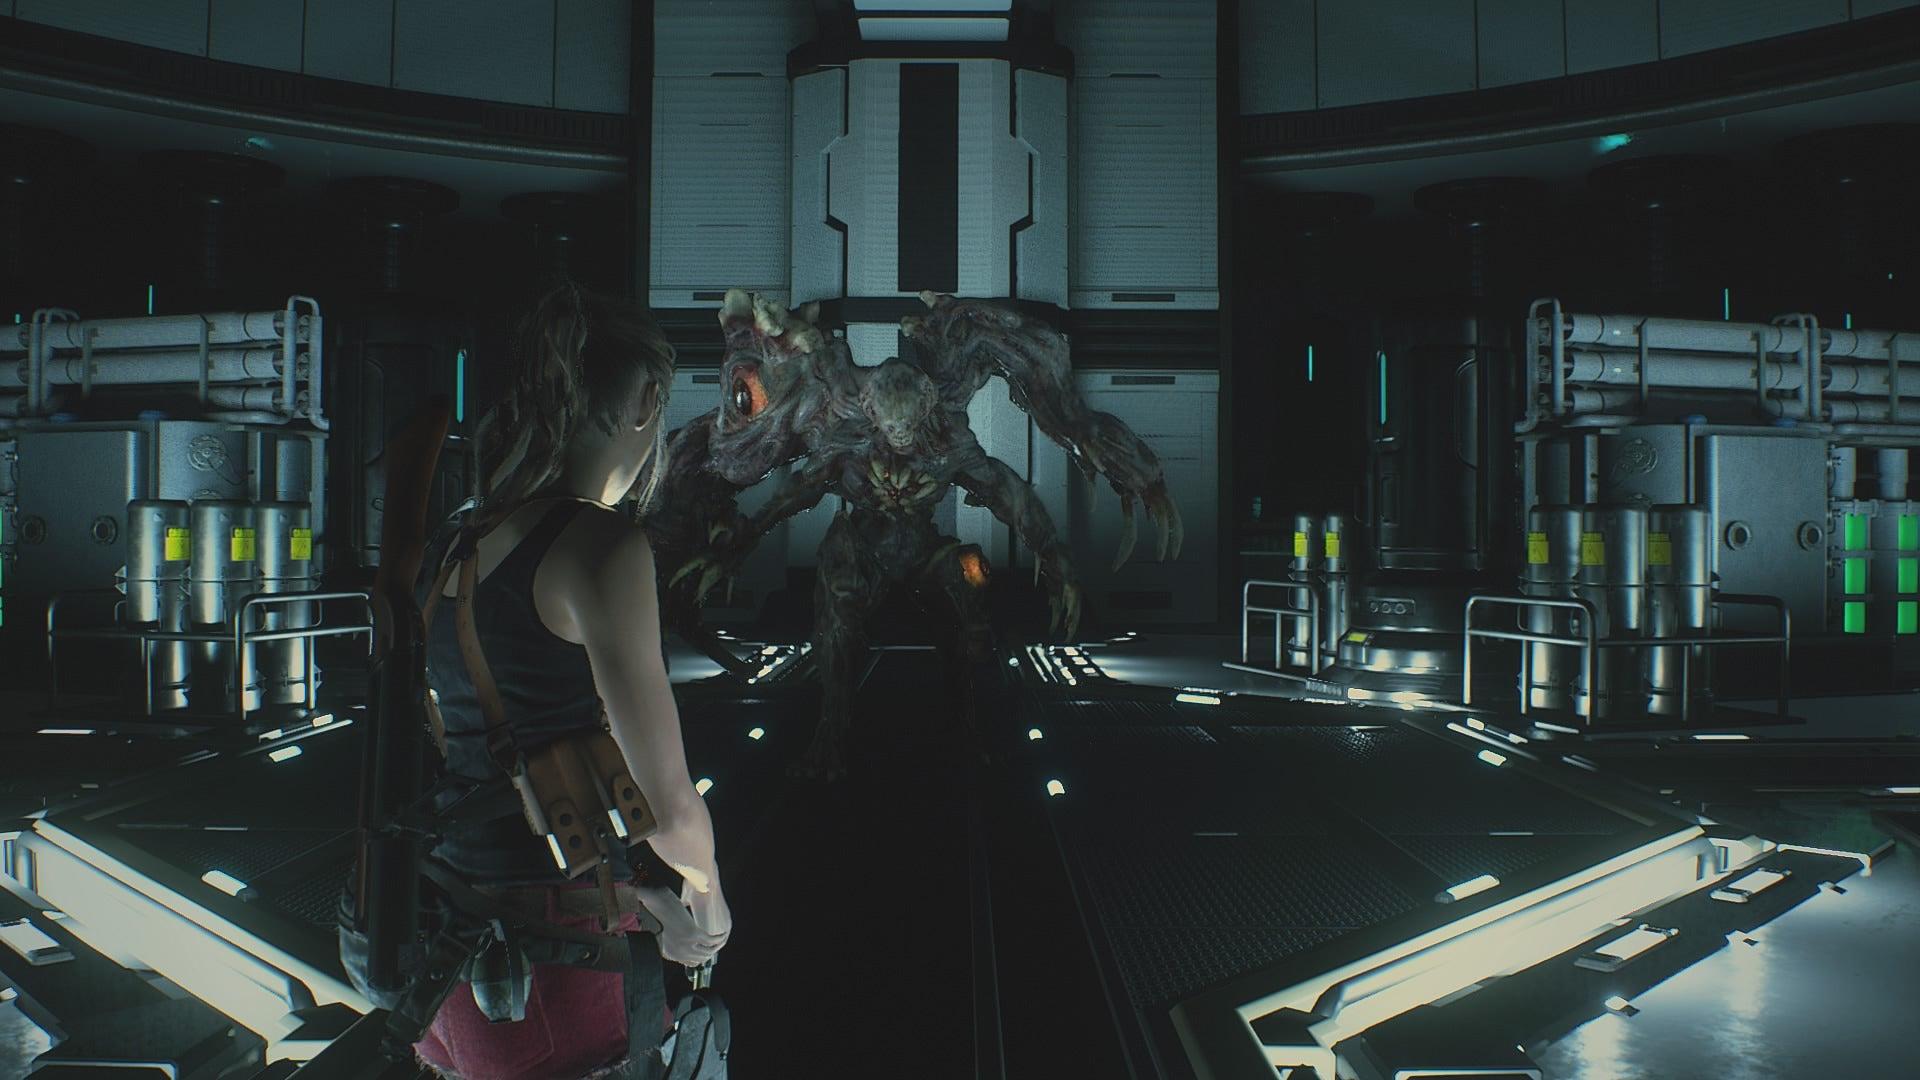 Image for Resident Evil 2 Remake Walkthrough Part 11 – Claire B - Alternate Lab